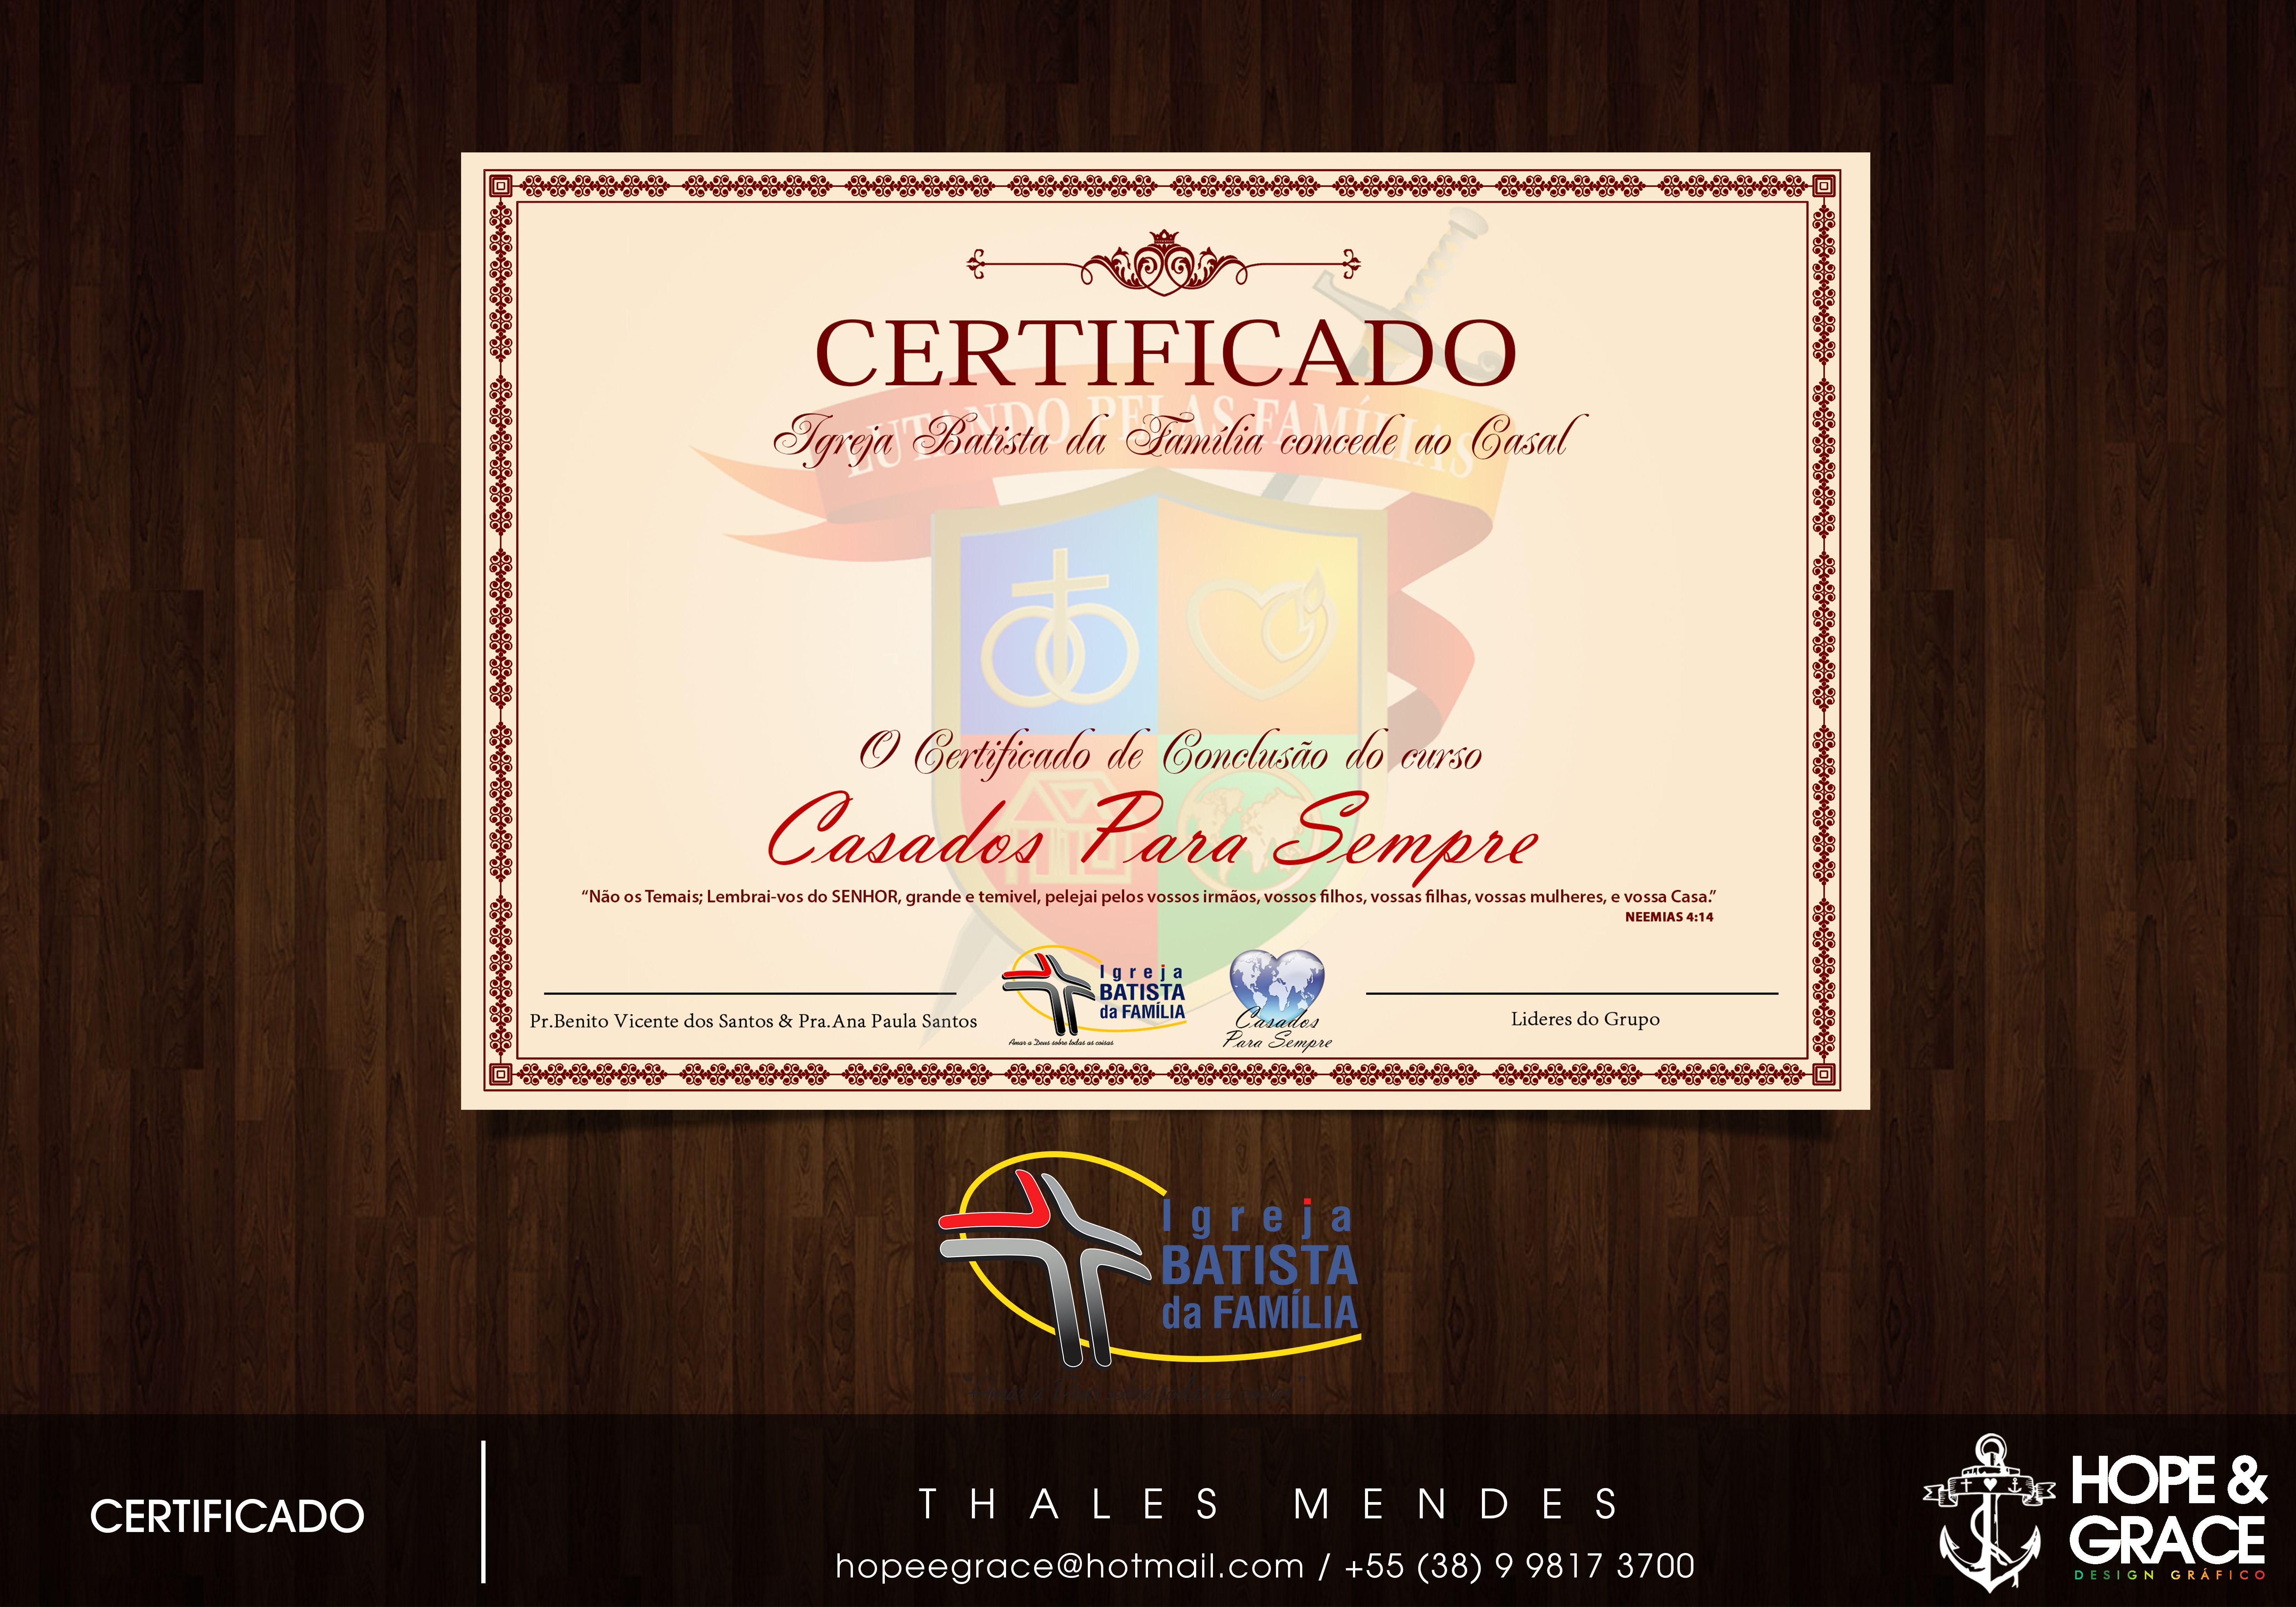 Certificado do curso Casados para Sempre da Igreja Batista.